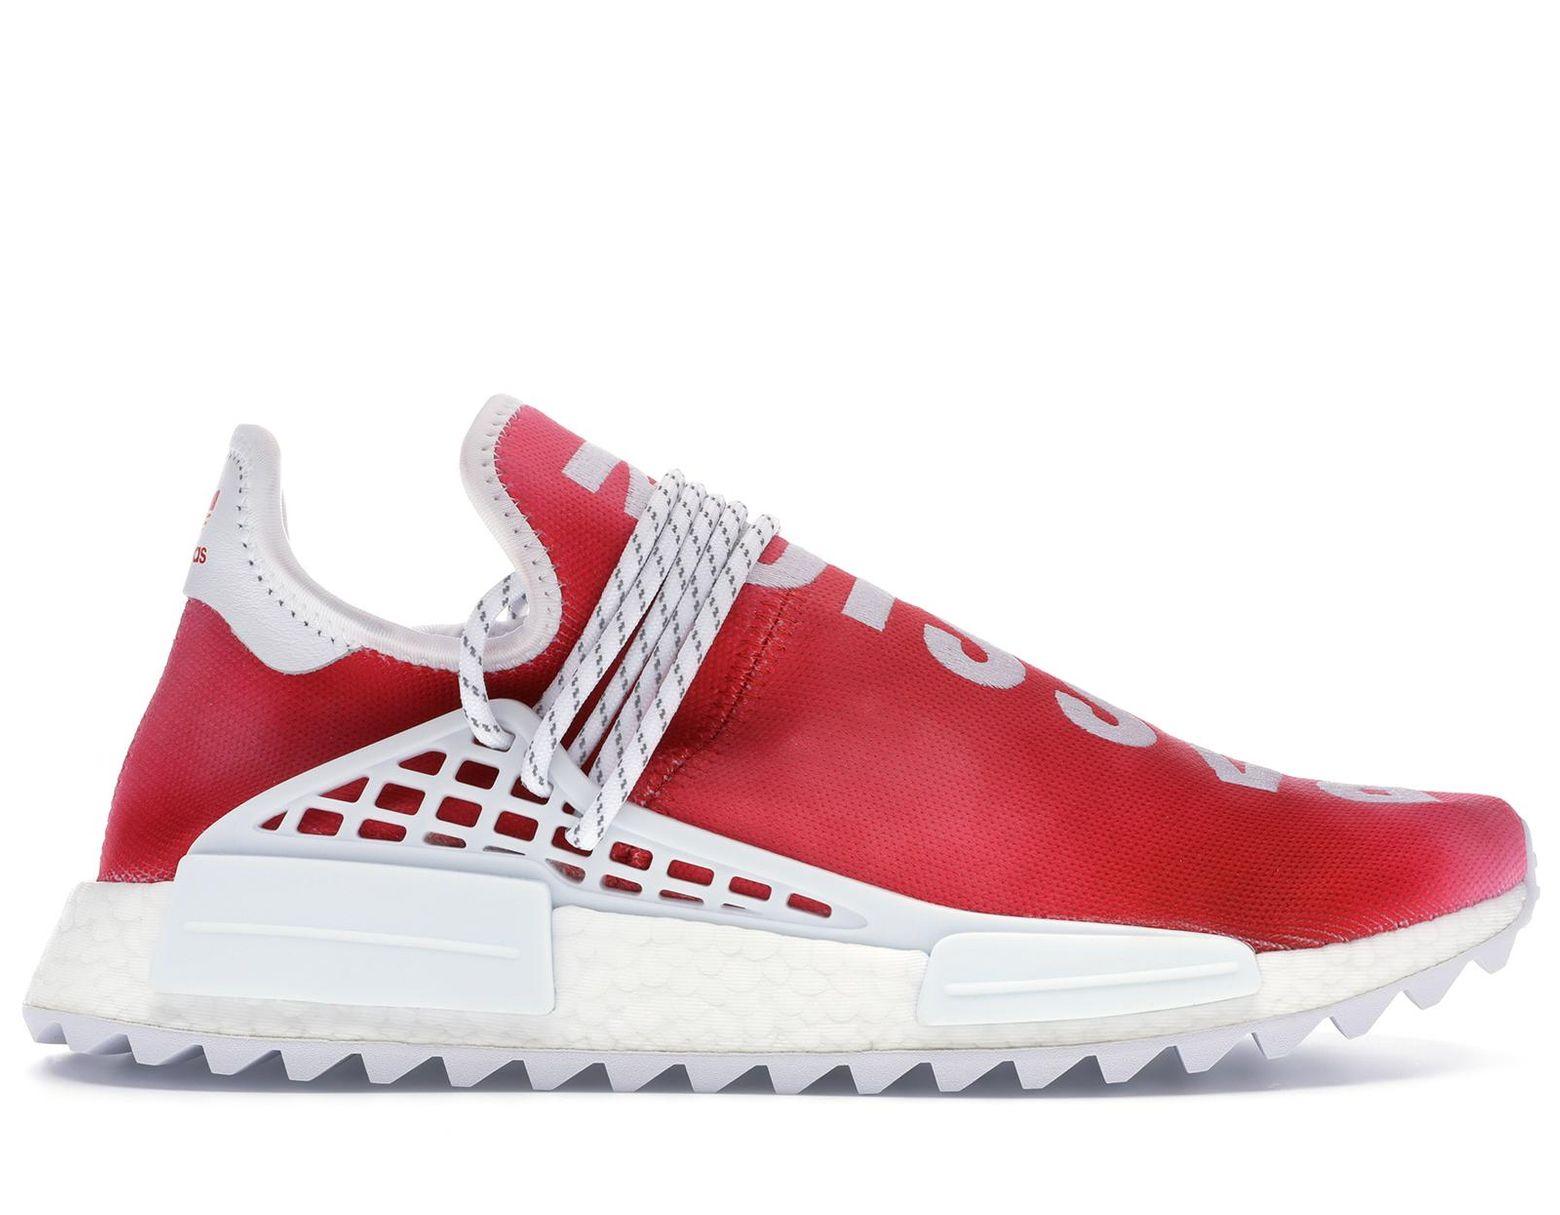 adidas Originals by Pharrell Williams Hu Holi NMD MC China Edition PEACE